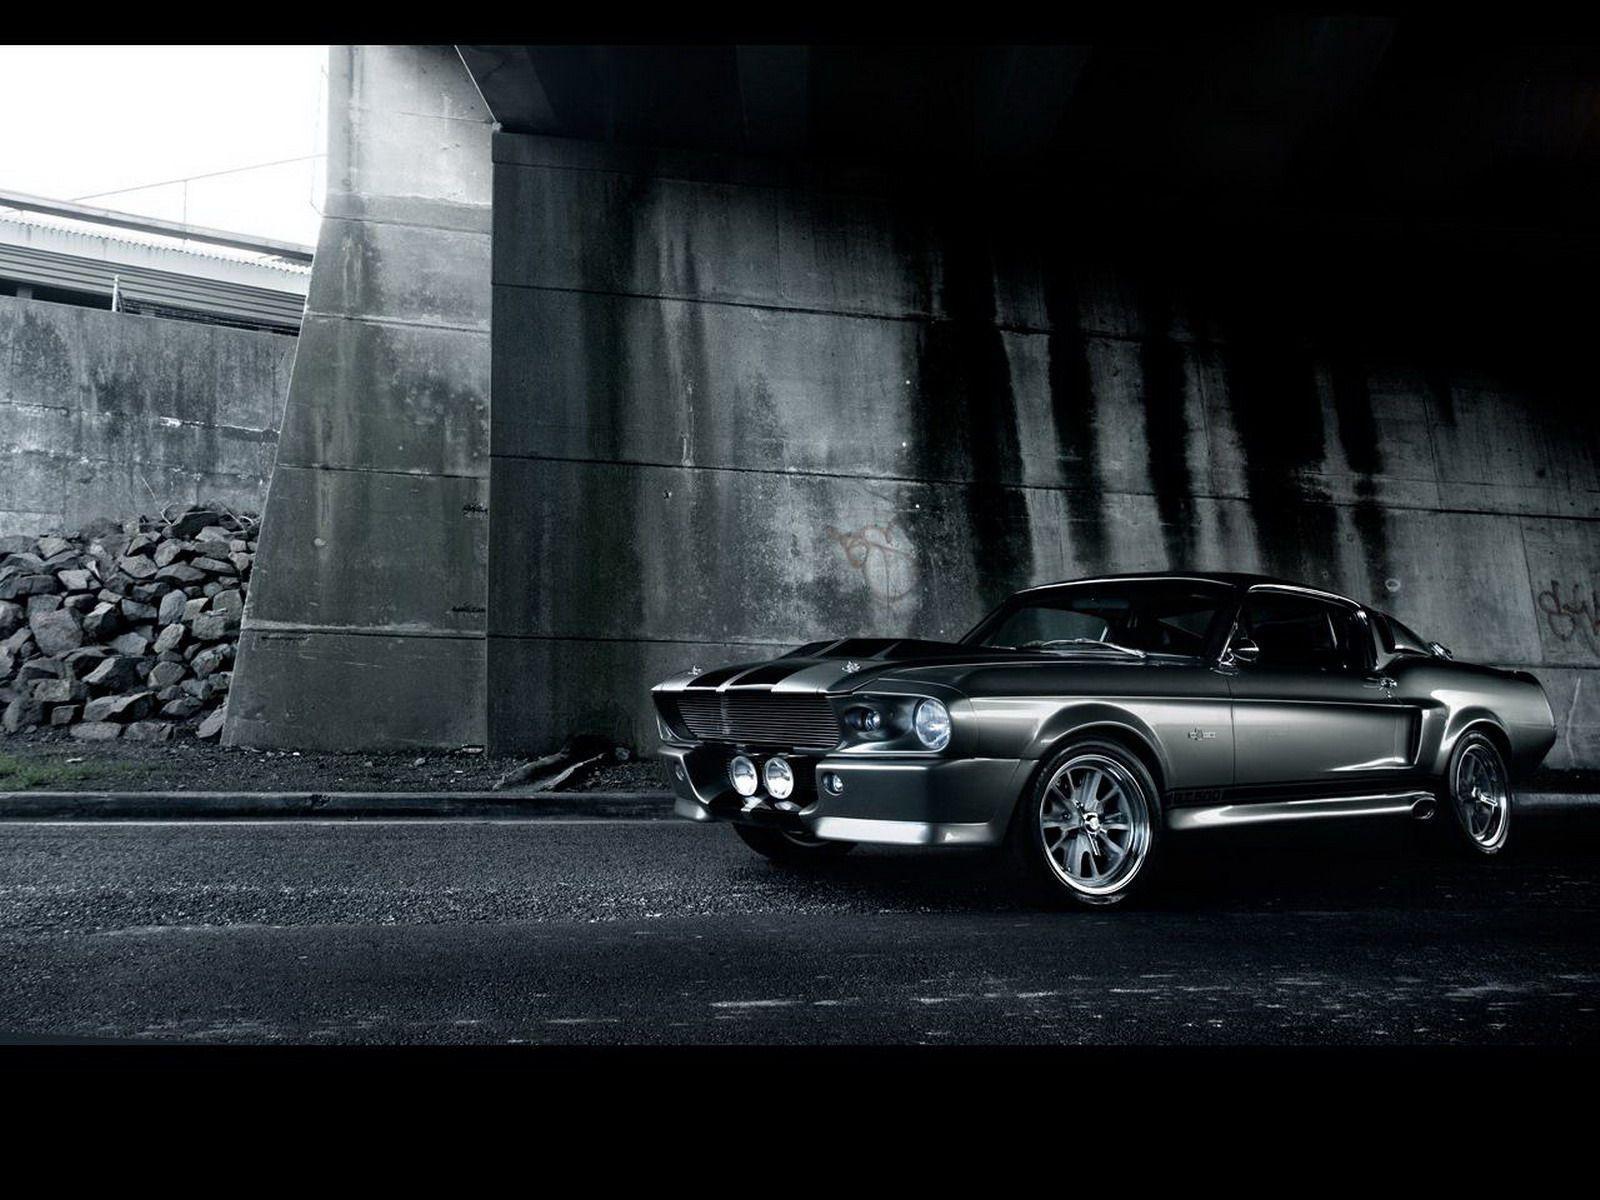 1967 Mustang Wallpapers 1600x1200